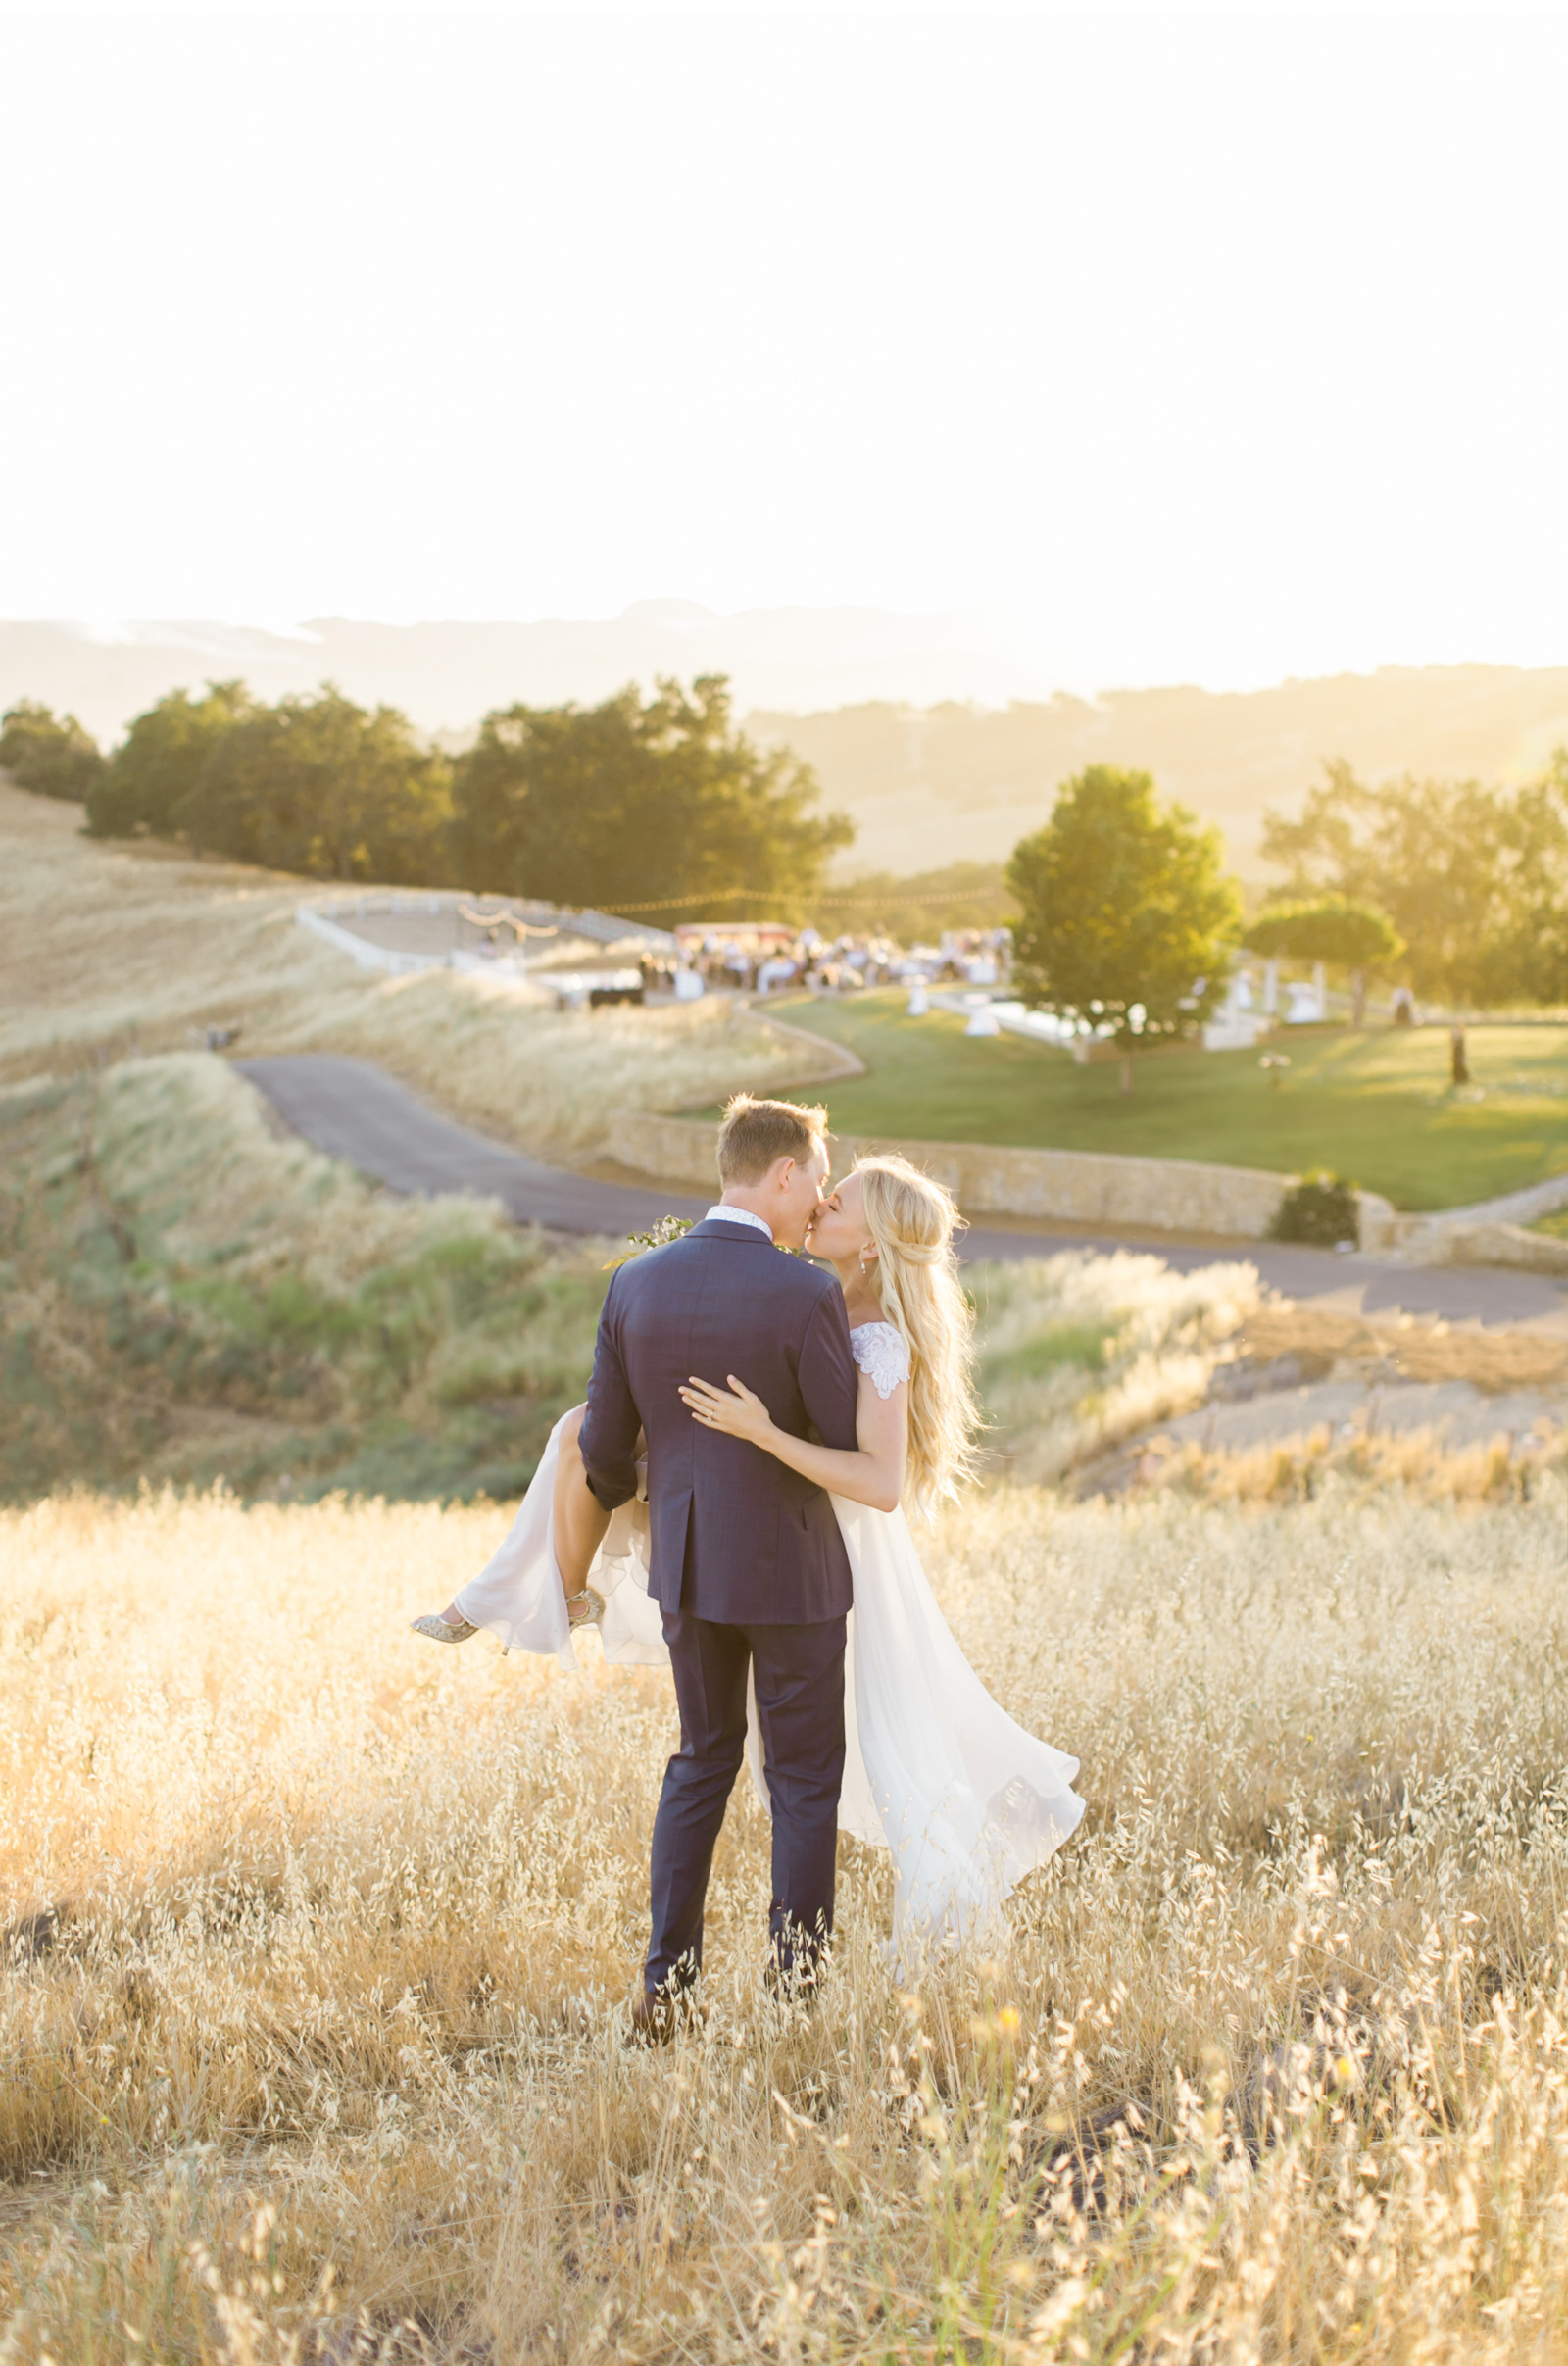 Style-Me-Pretty-California-Wedding-San-Luis-Obispo-Paso-Robles-Natalie-Schutt-Photography_18.jpg